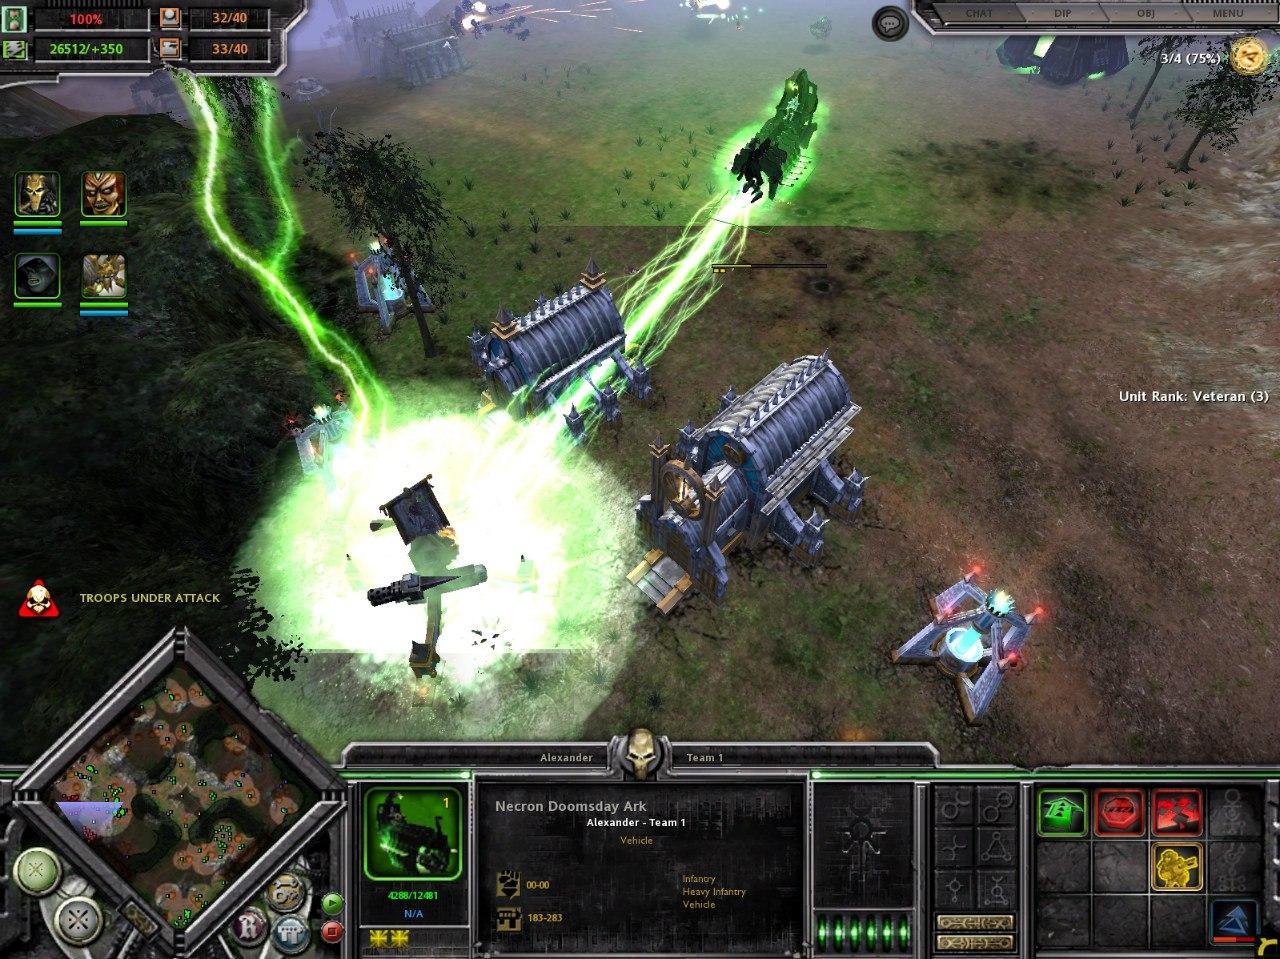 Necron Doomsday Ark  Firing Doomsday Cannon  image